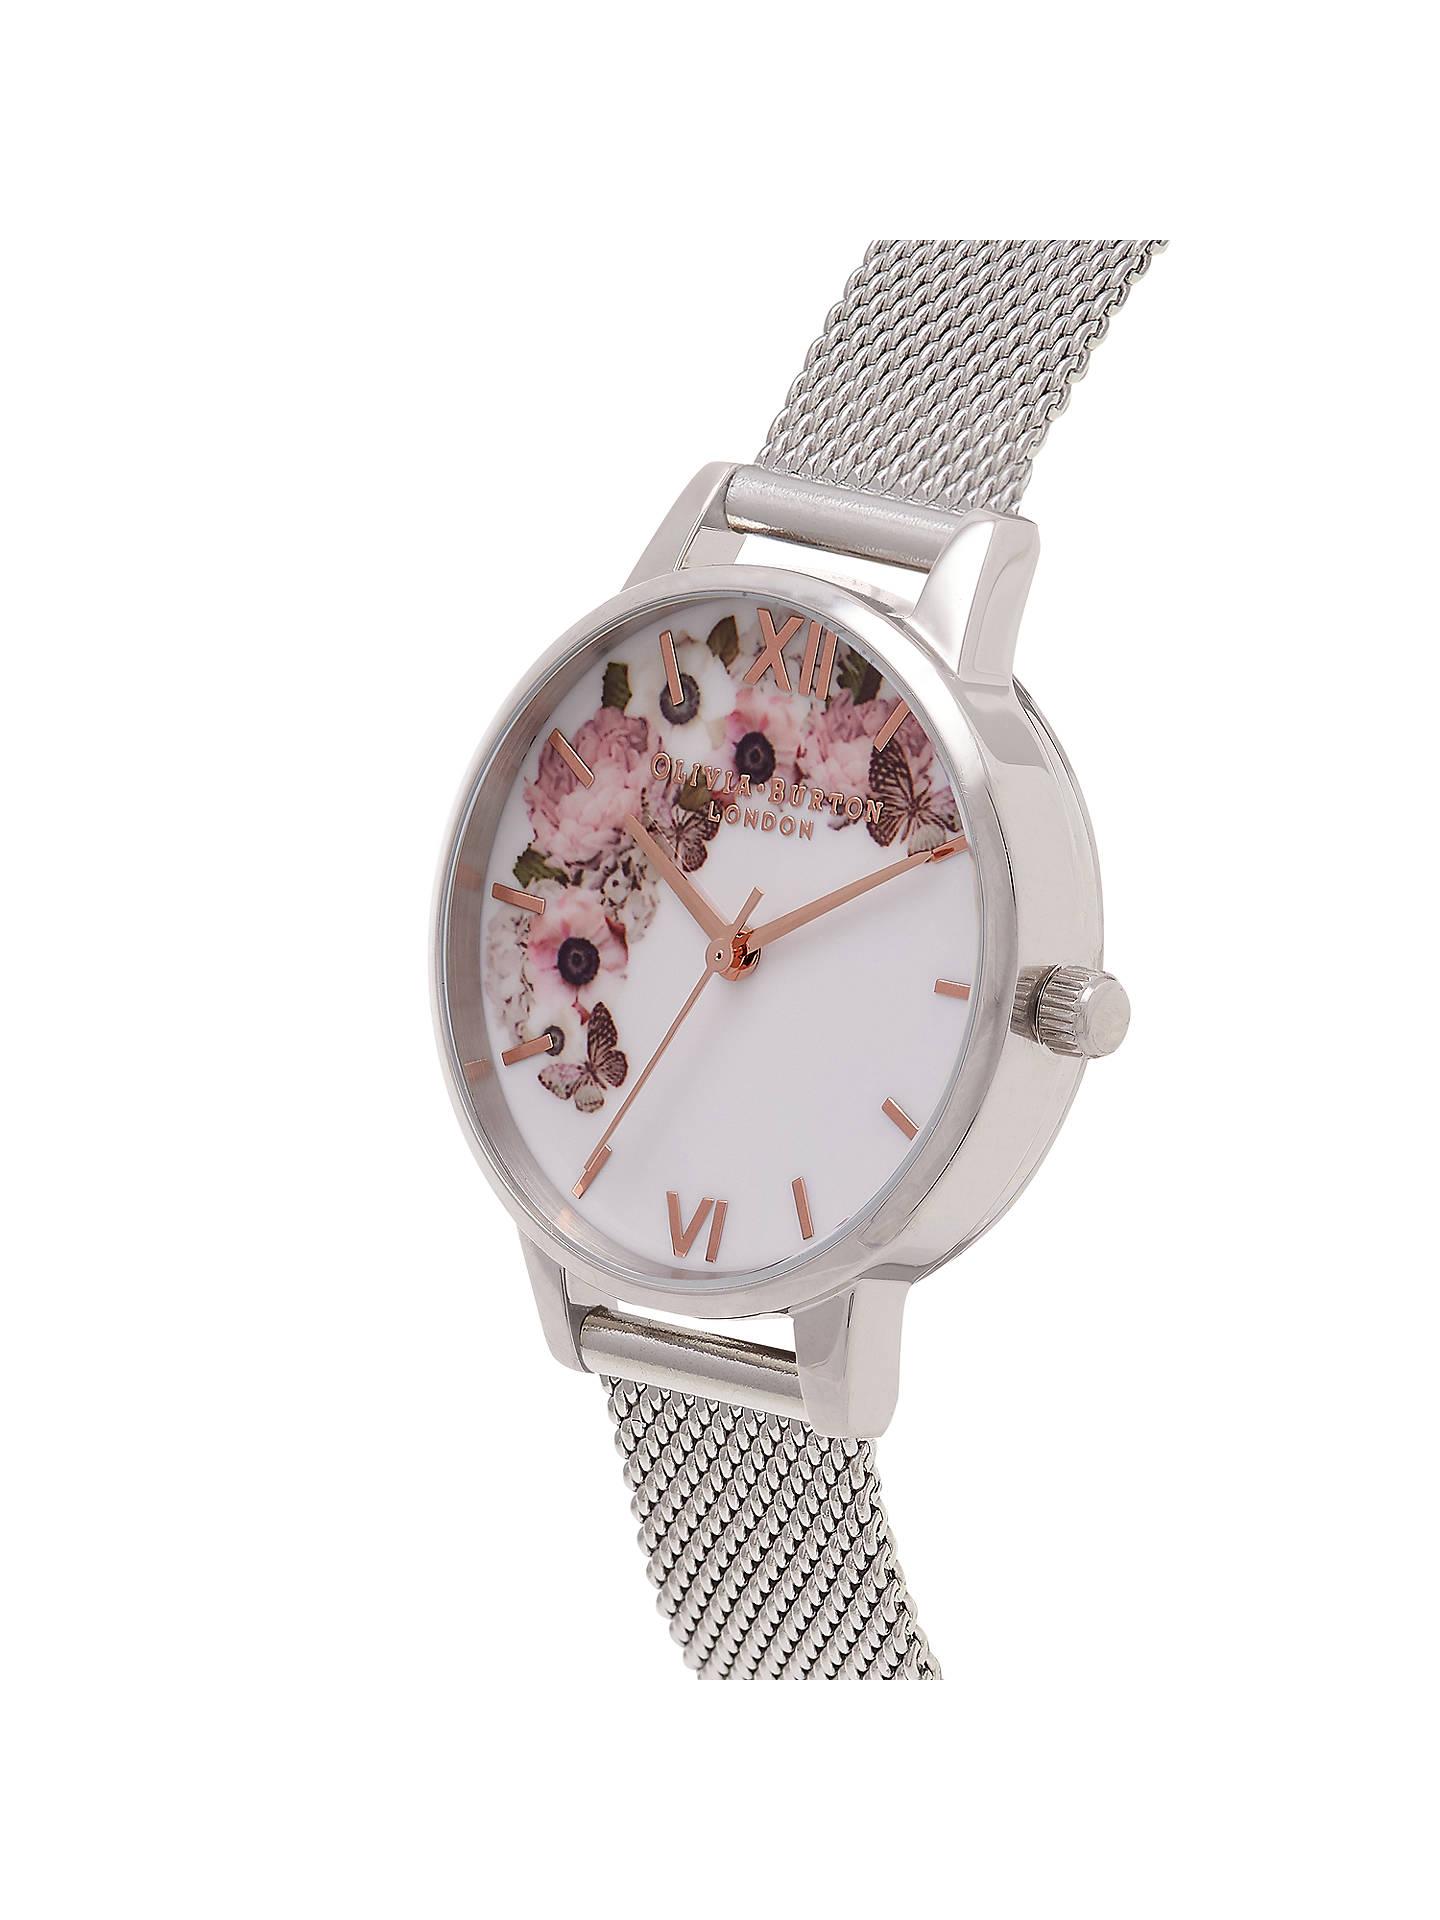 1dbe50f3ac7 ... Buy Olivia Burton OB16WG30 Women s Signature Florals Mesh Bracelet  Strap Watch